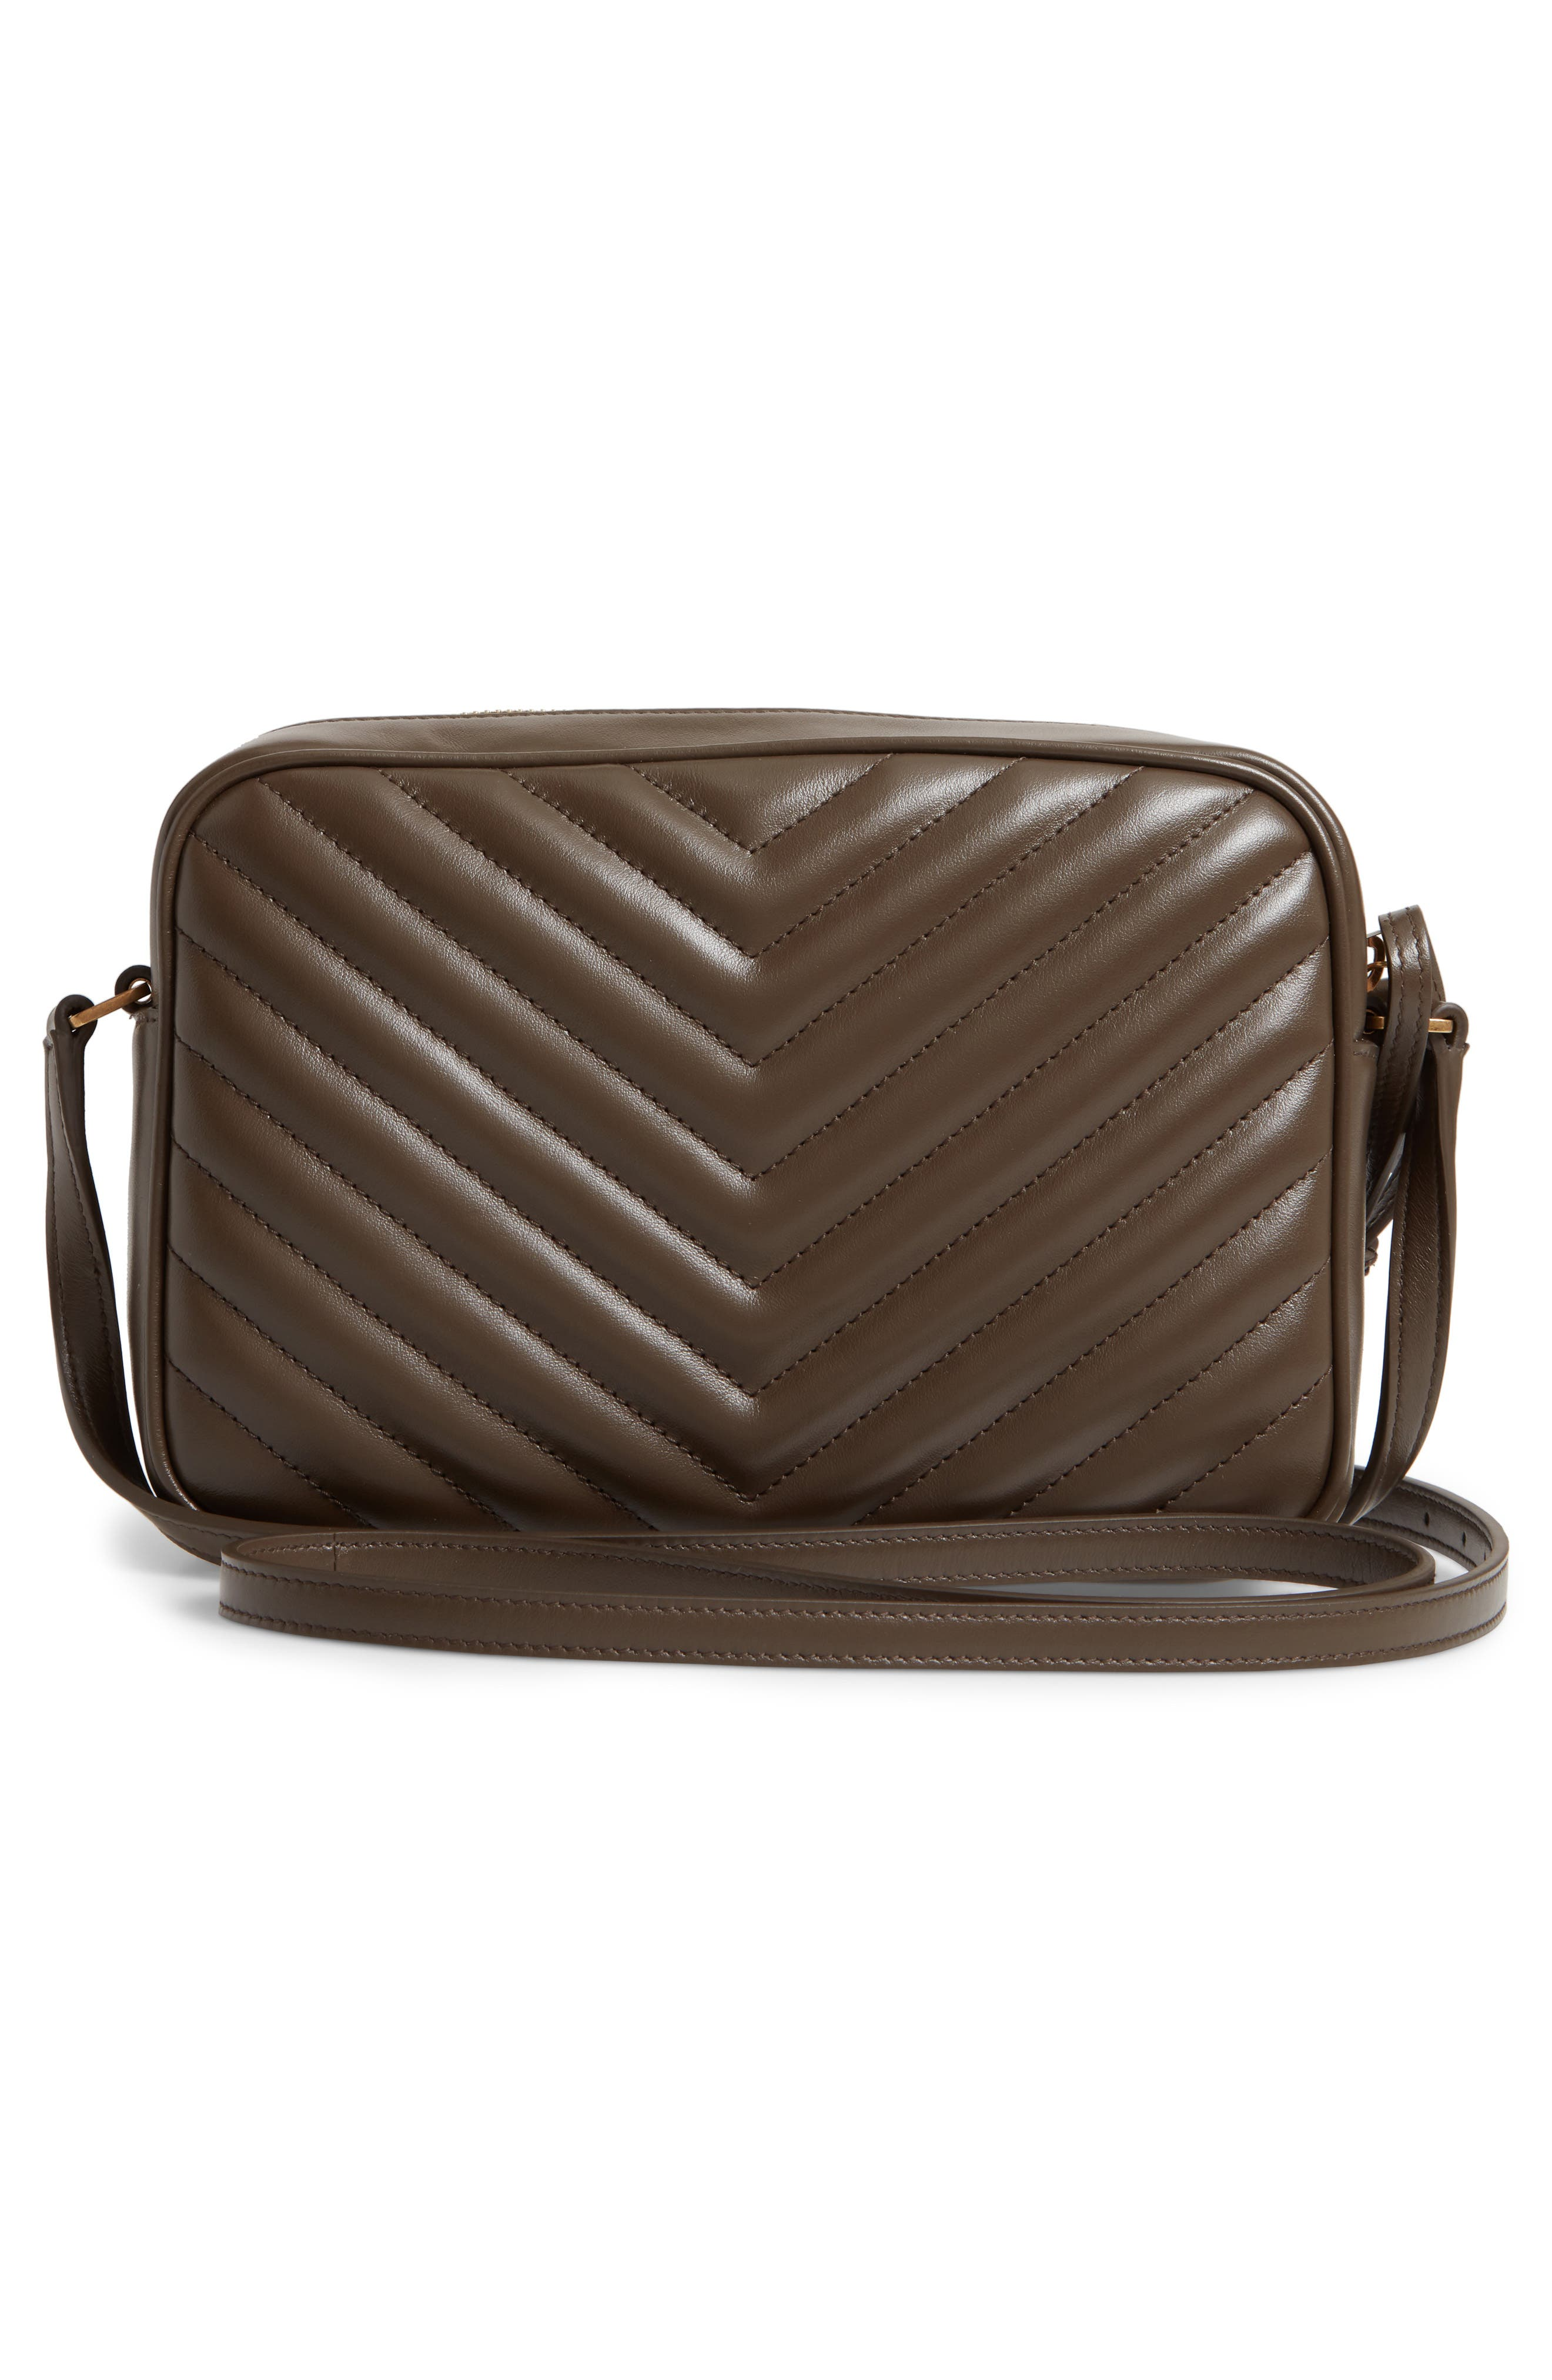 Medium Lou Calfskin Leather Camera Bag,                             Alternate thumbnail 3, color,                             200